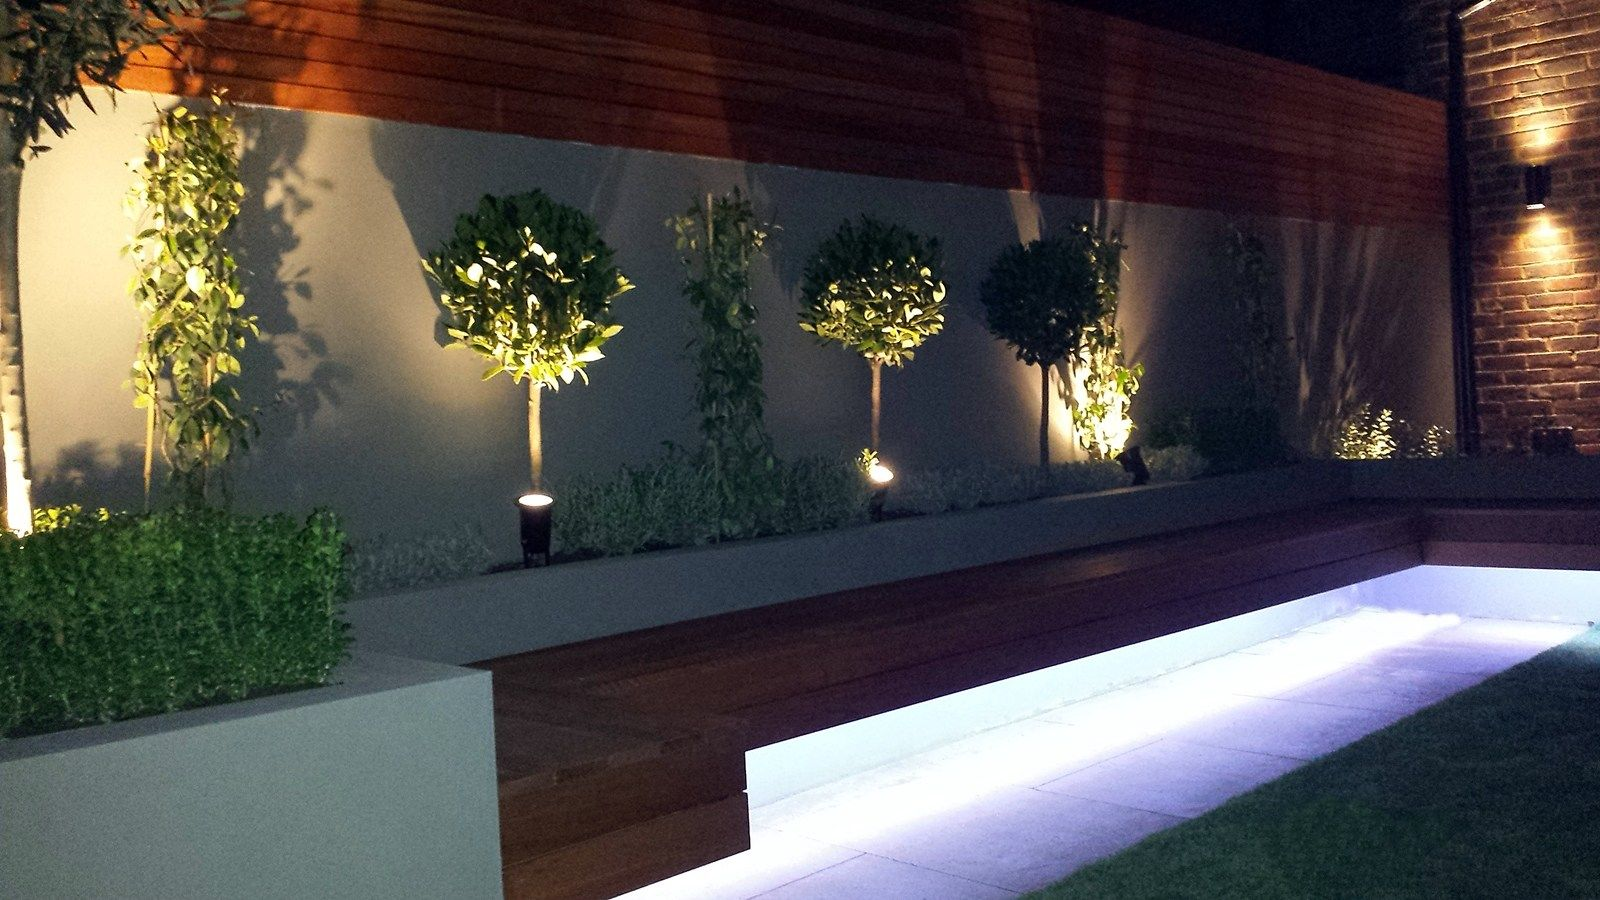 20 Beautiful Ways To Small Garden Lighting Ideas Inspira Spaces Modern Garden Design Garden Lighting Design Landscape Lighting Design